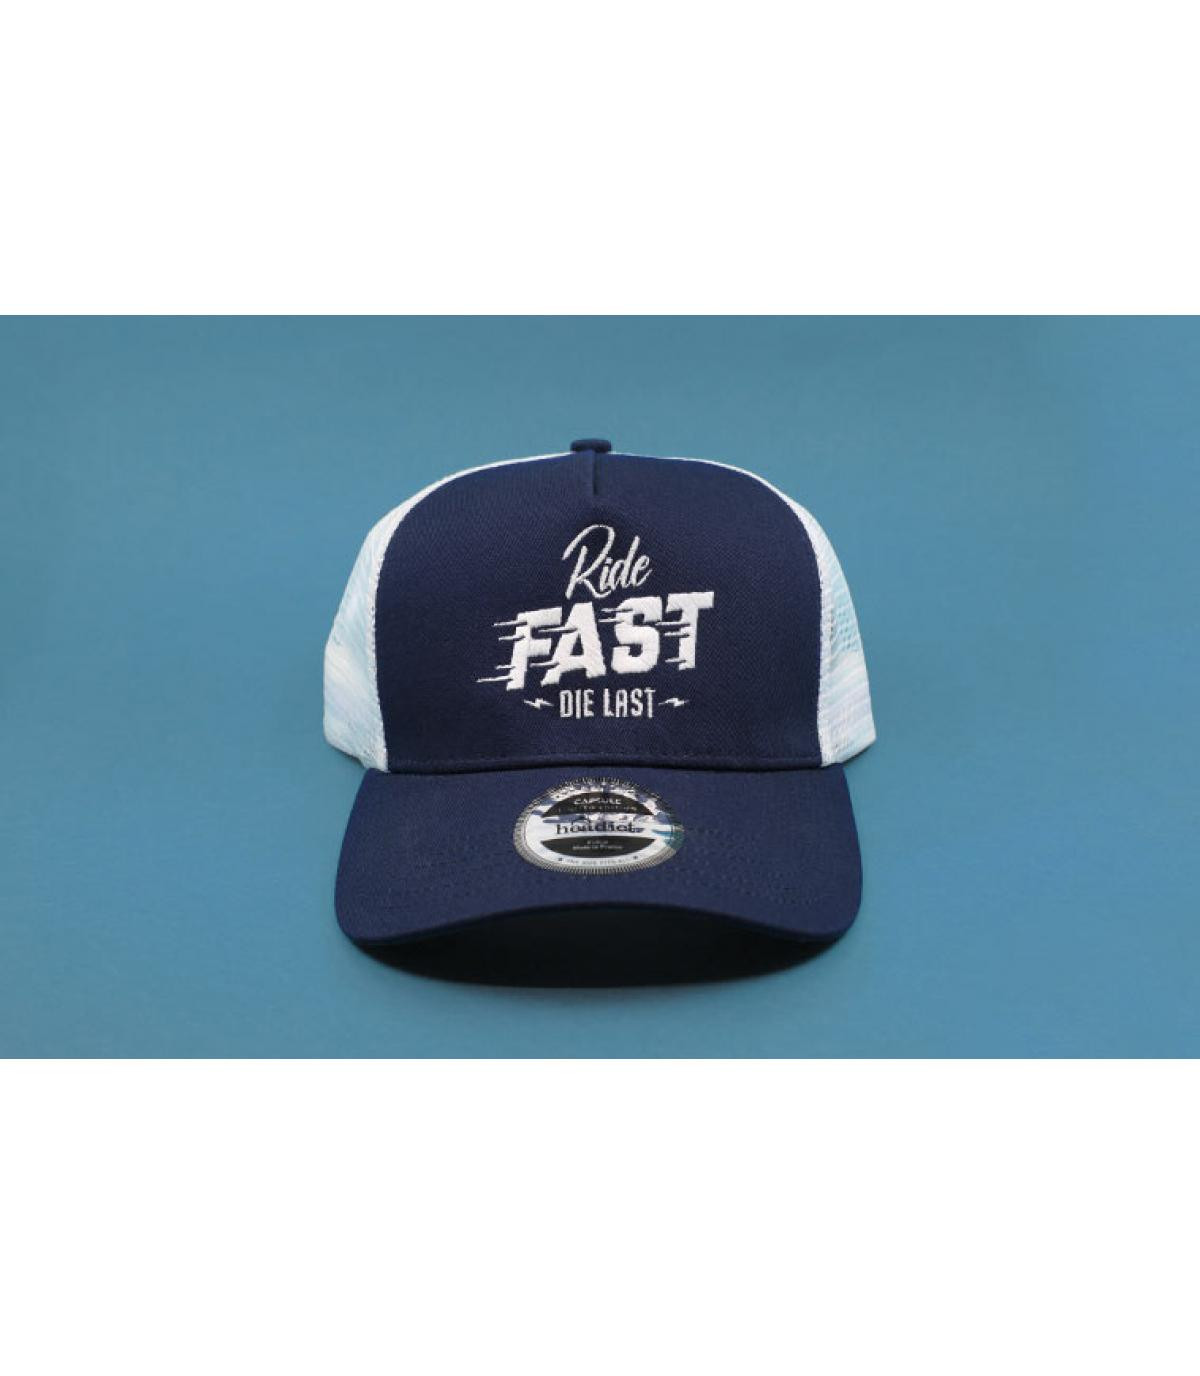 Details Trucker Ride Fast - Abbildung 3